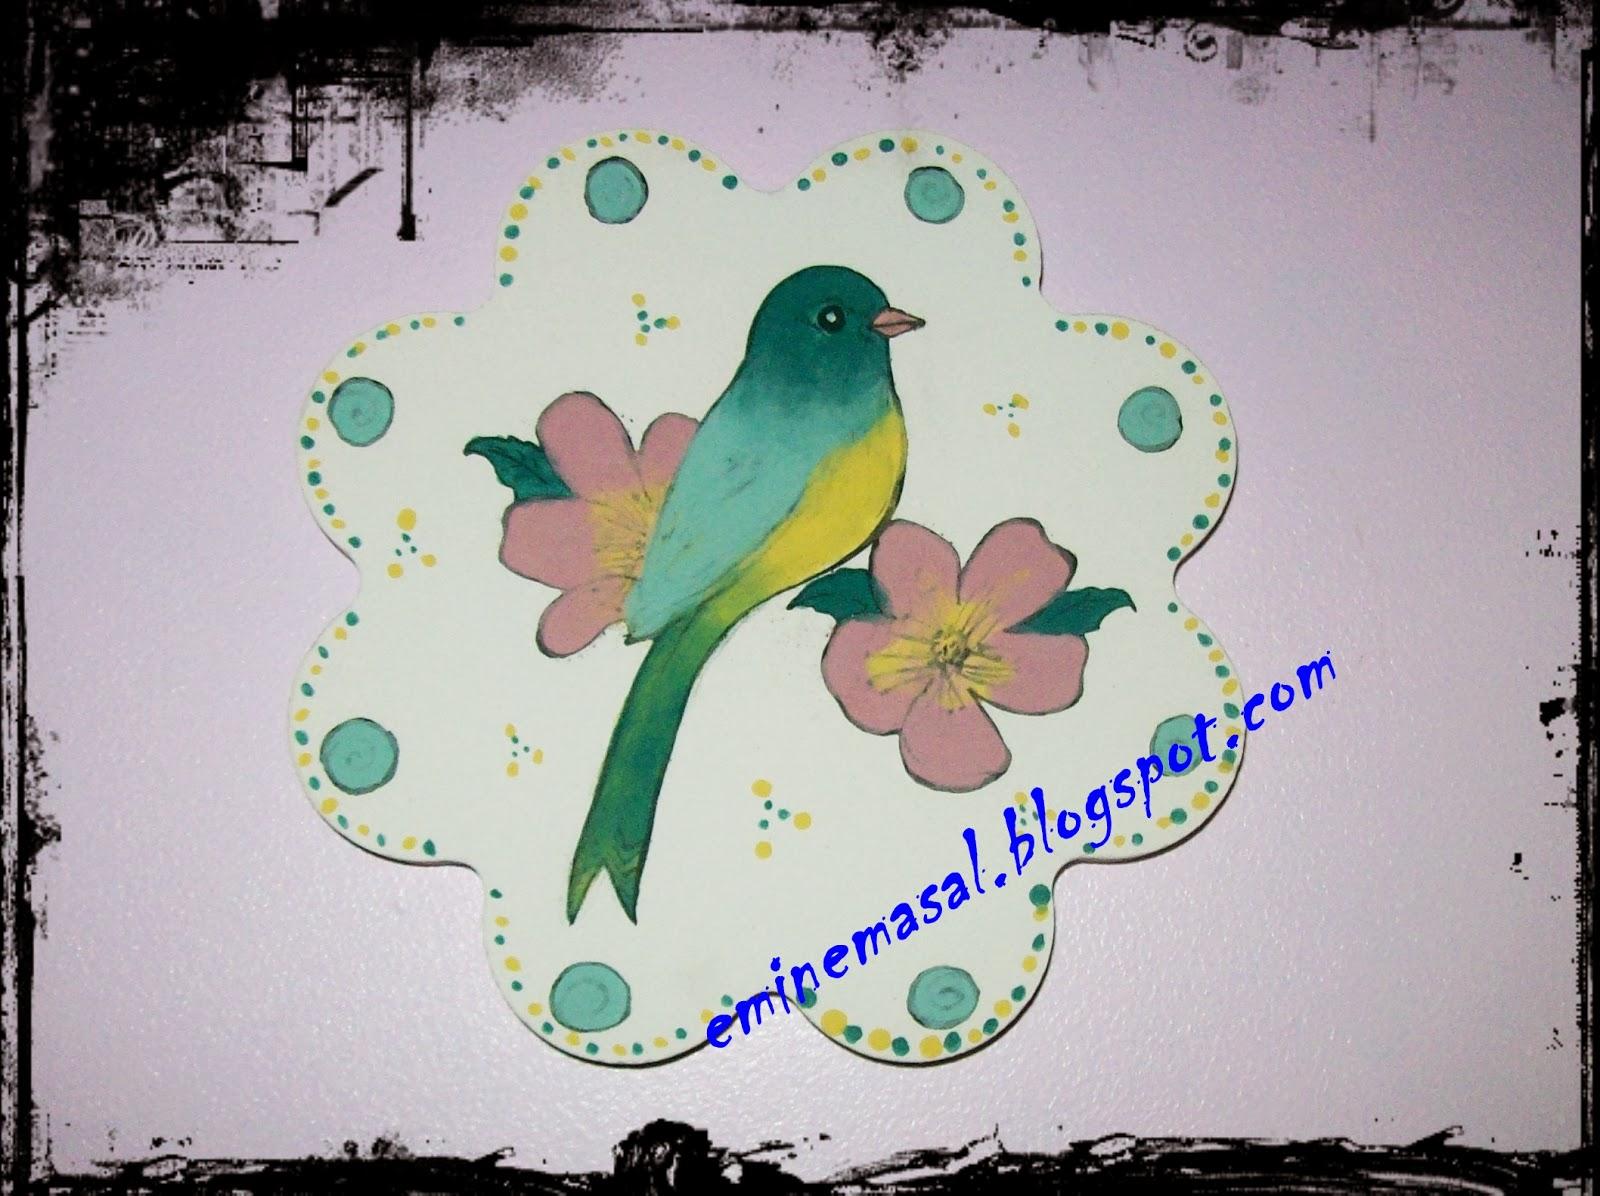 Araba Boyama Sayfasi Egitimhane Coloring Free To Print